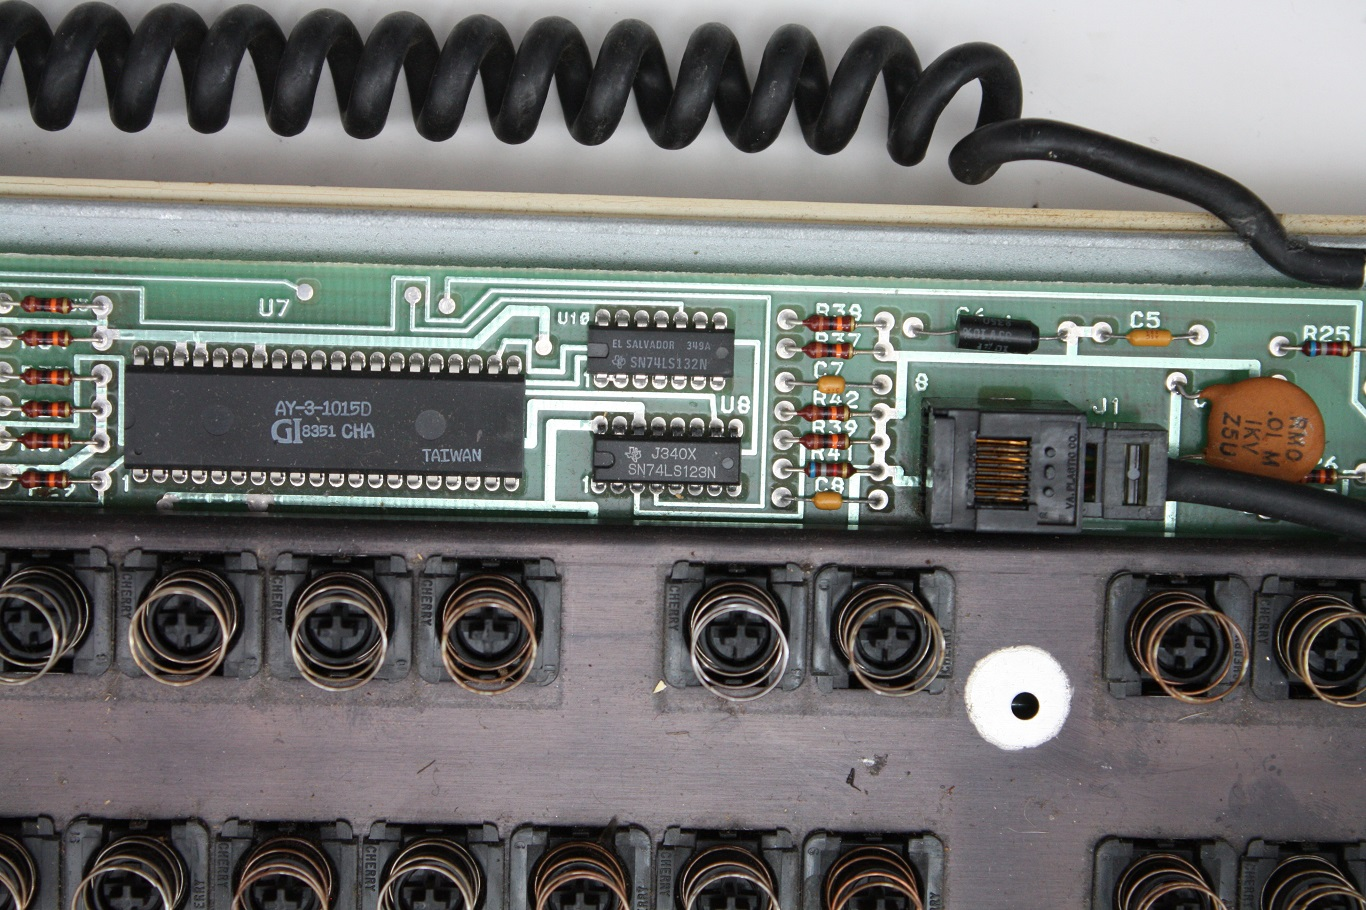 Cherry Terminal Keyboard - PCB components 2.jpg